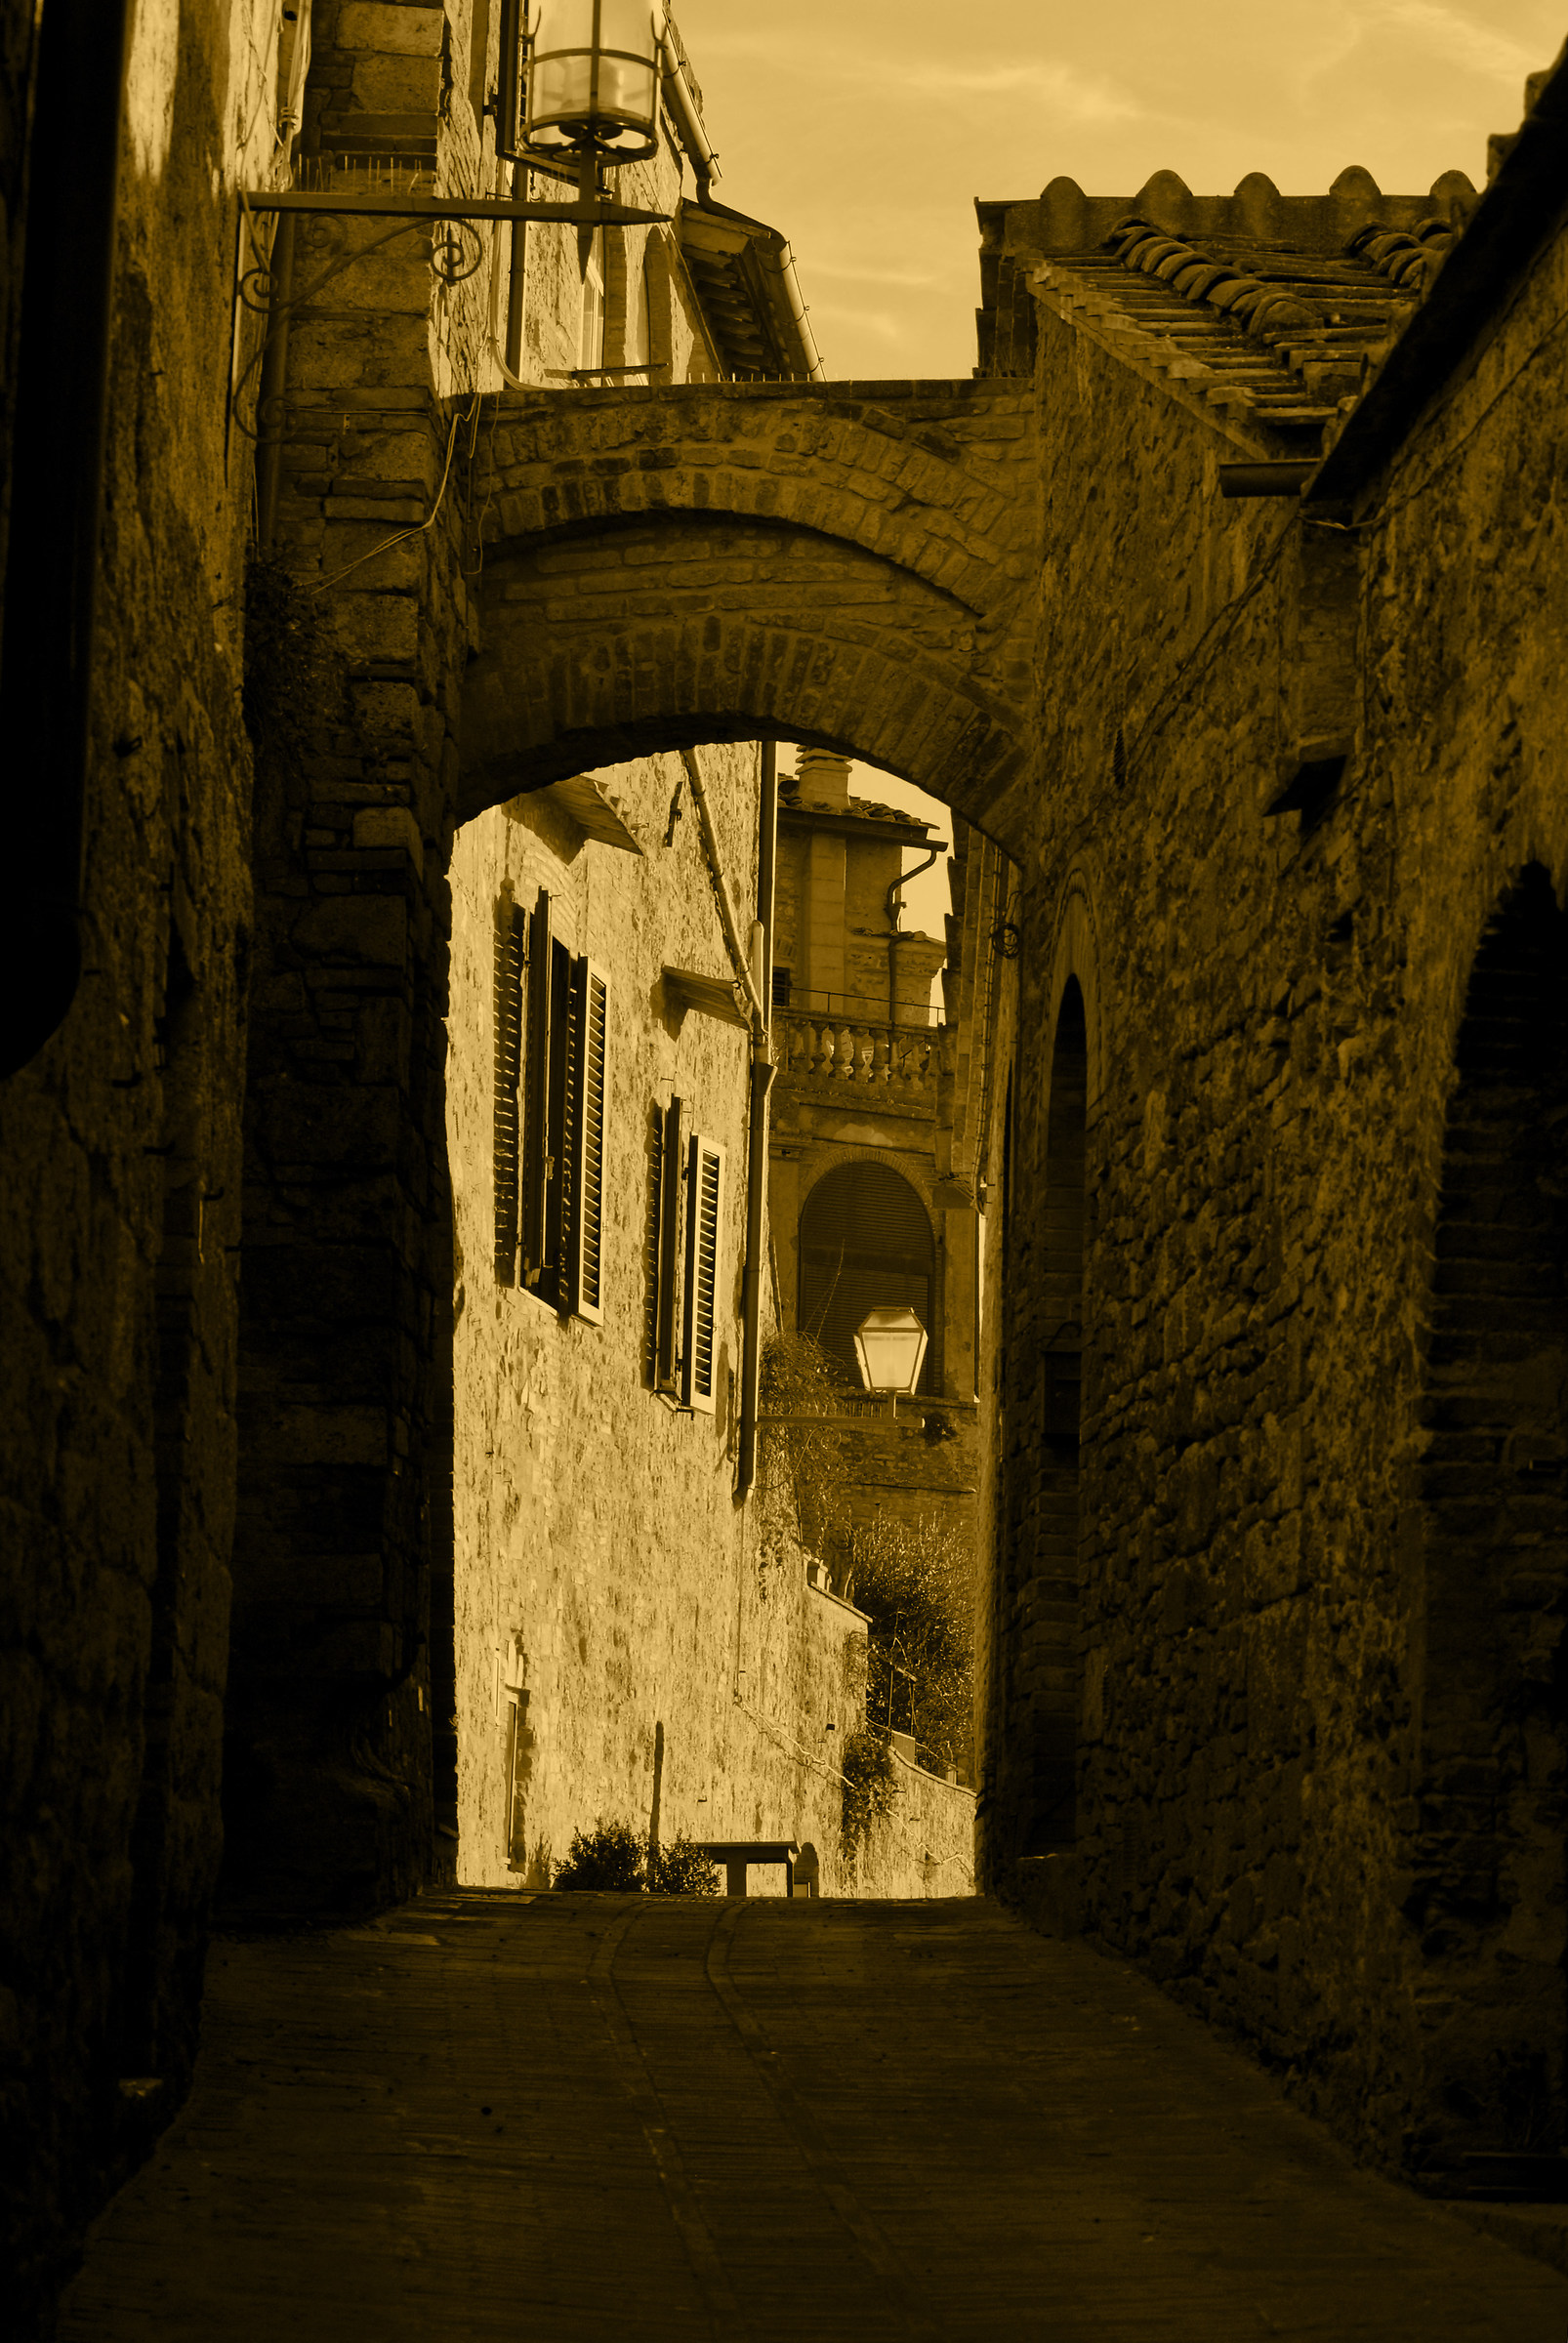 Peering through the streets of San Gimignano...